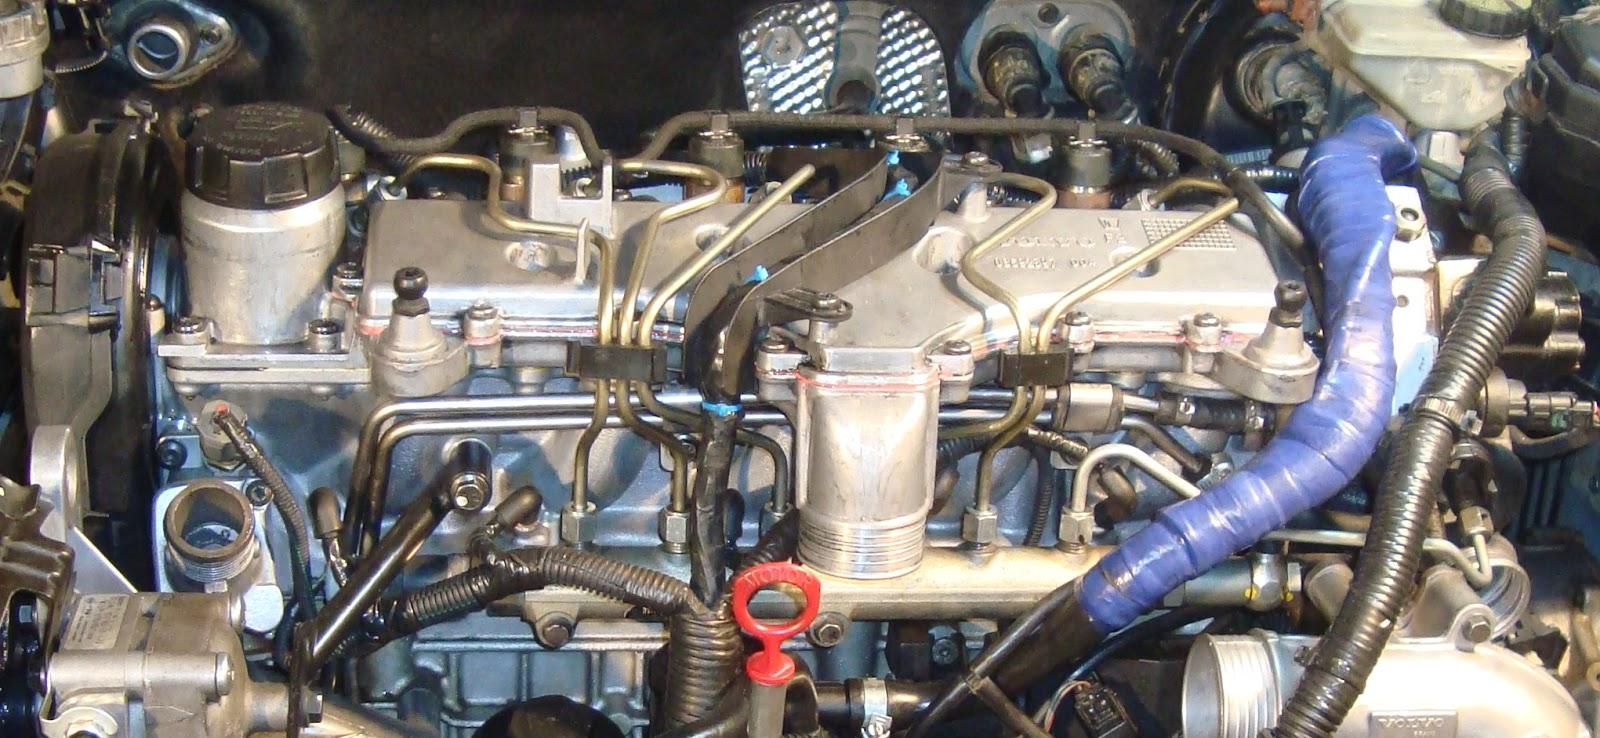 Fallo P0087 Presion Combustible Baja Solucion